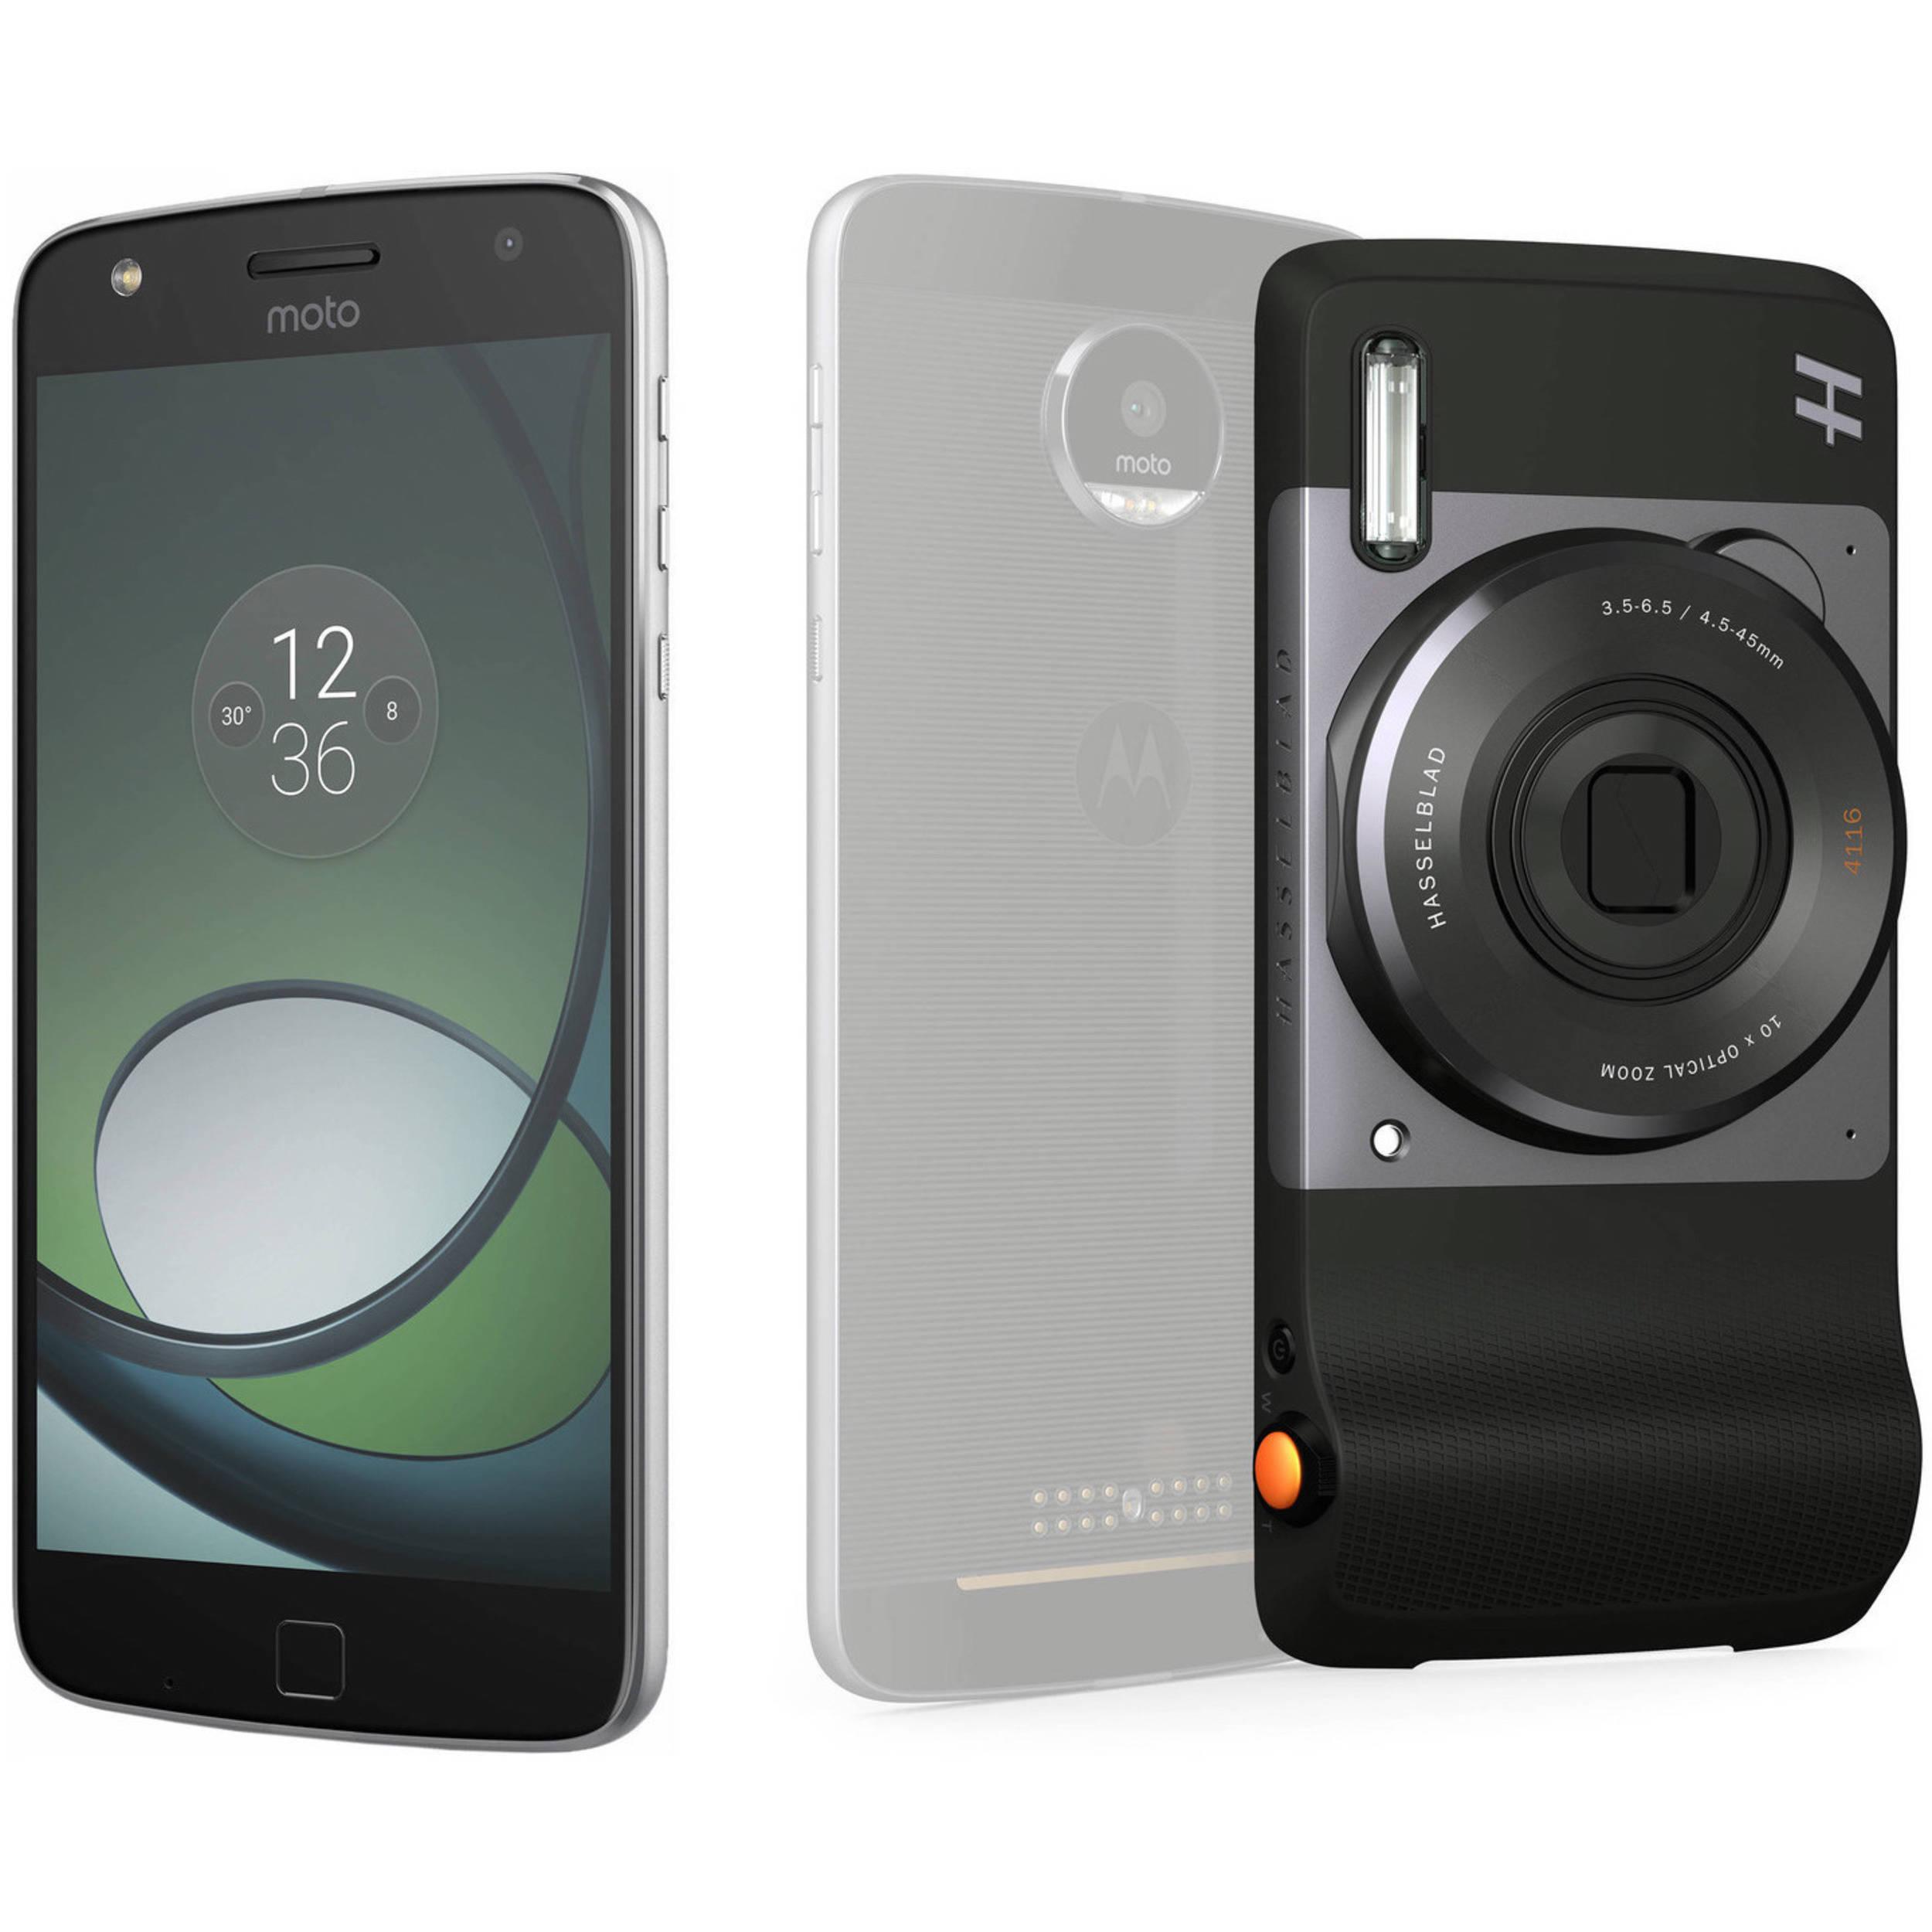 moto play. moto z play xt1635 32gb smartphone (unlocked, lunar gray) with hasselblad true zoom o